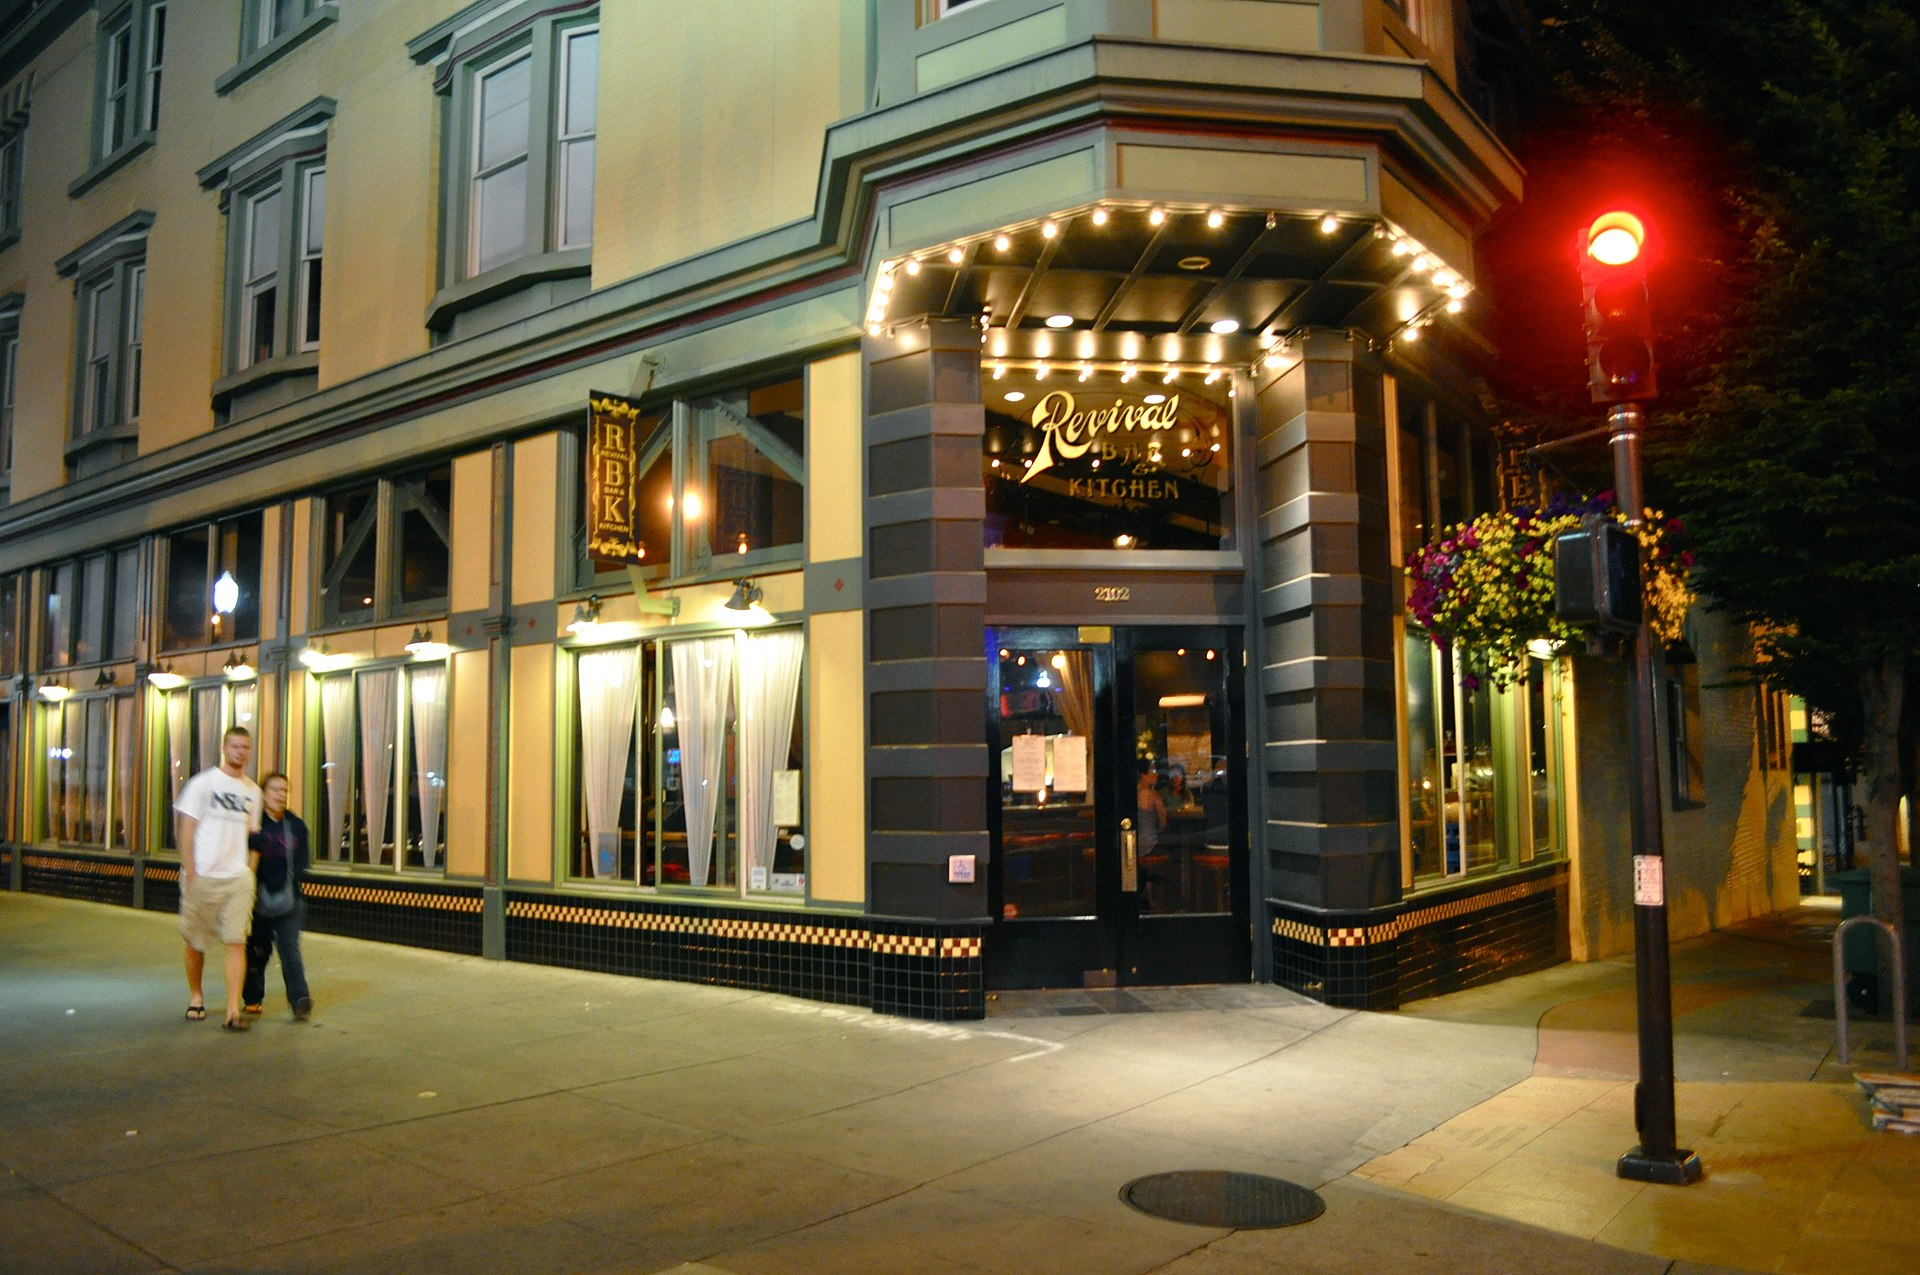 Revival Bar And Kitchen Cocktail Menu